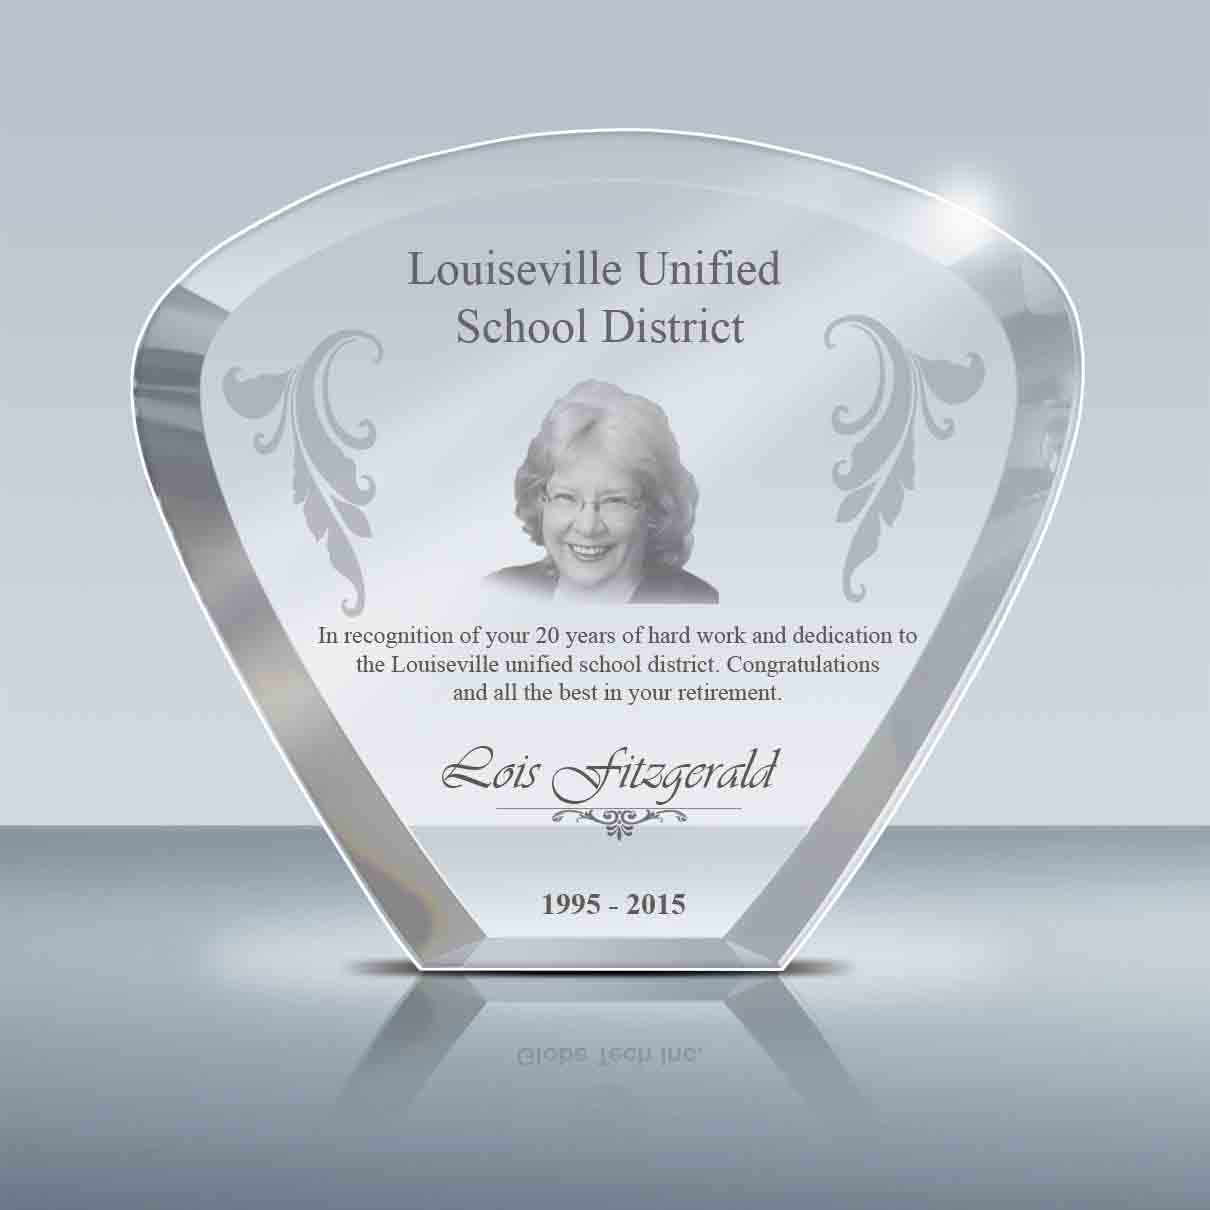 Goodcount Awards Custom Engraved Crystal Awards